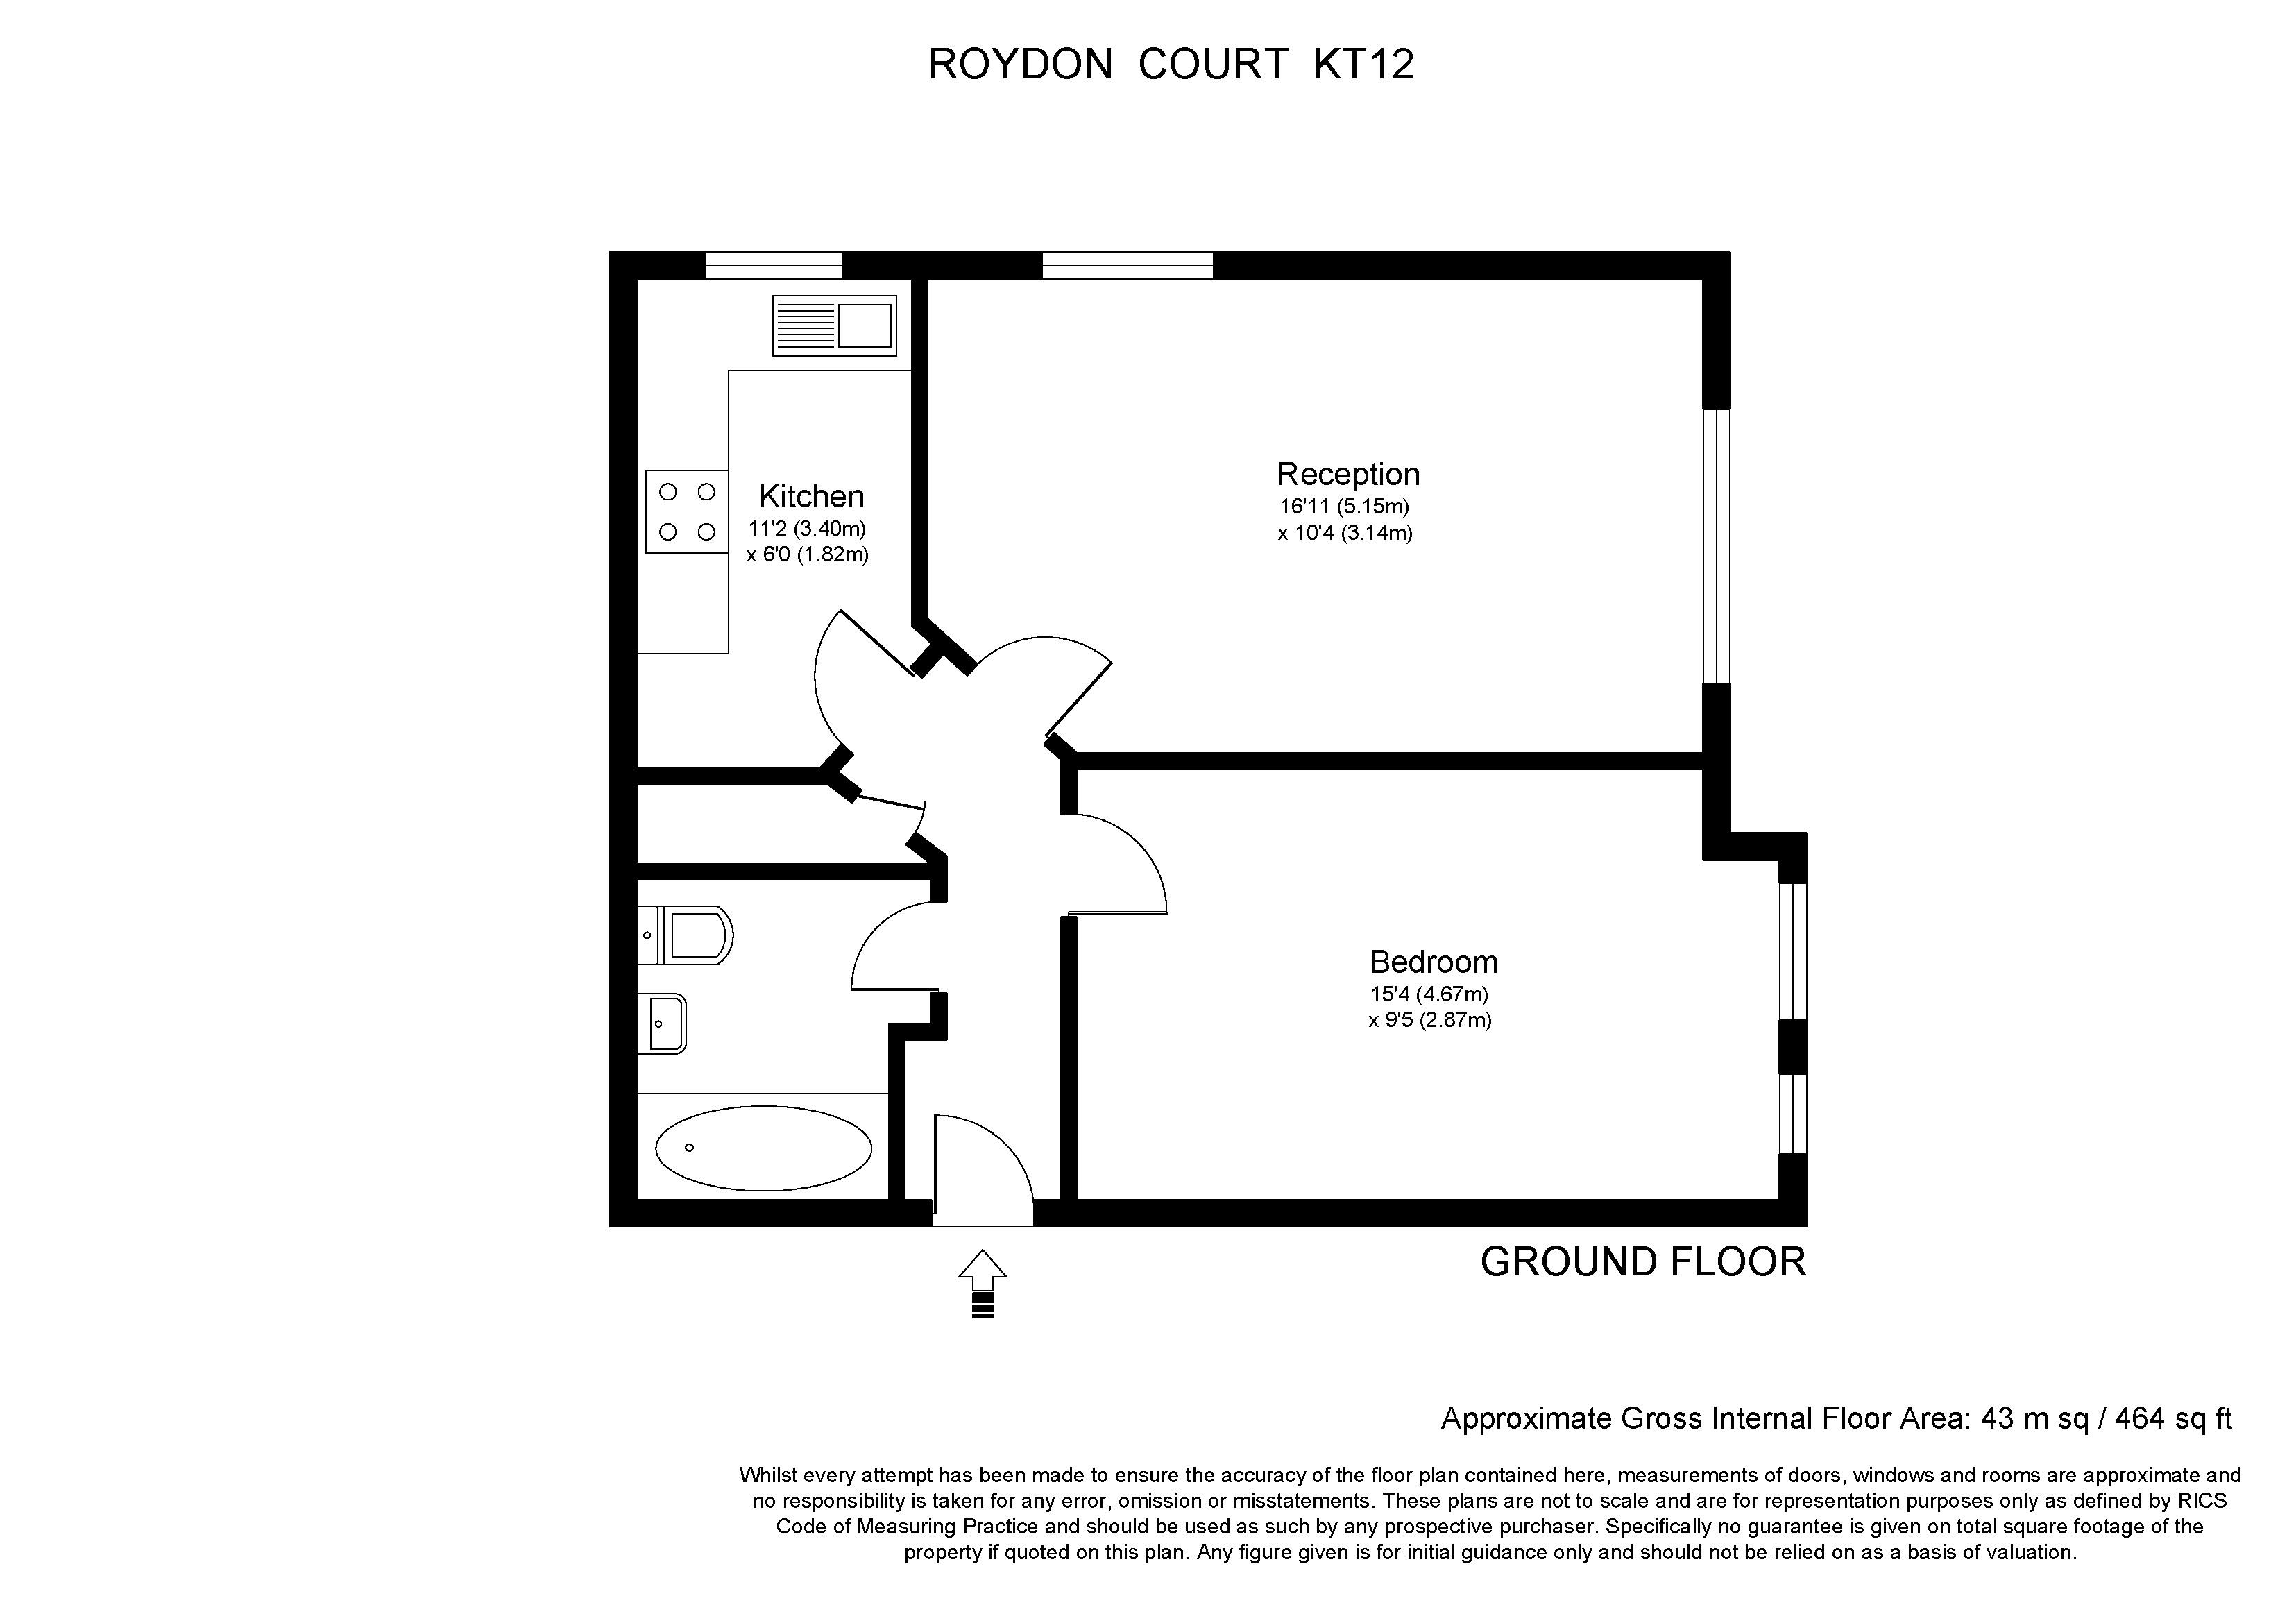 Roydon Court